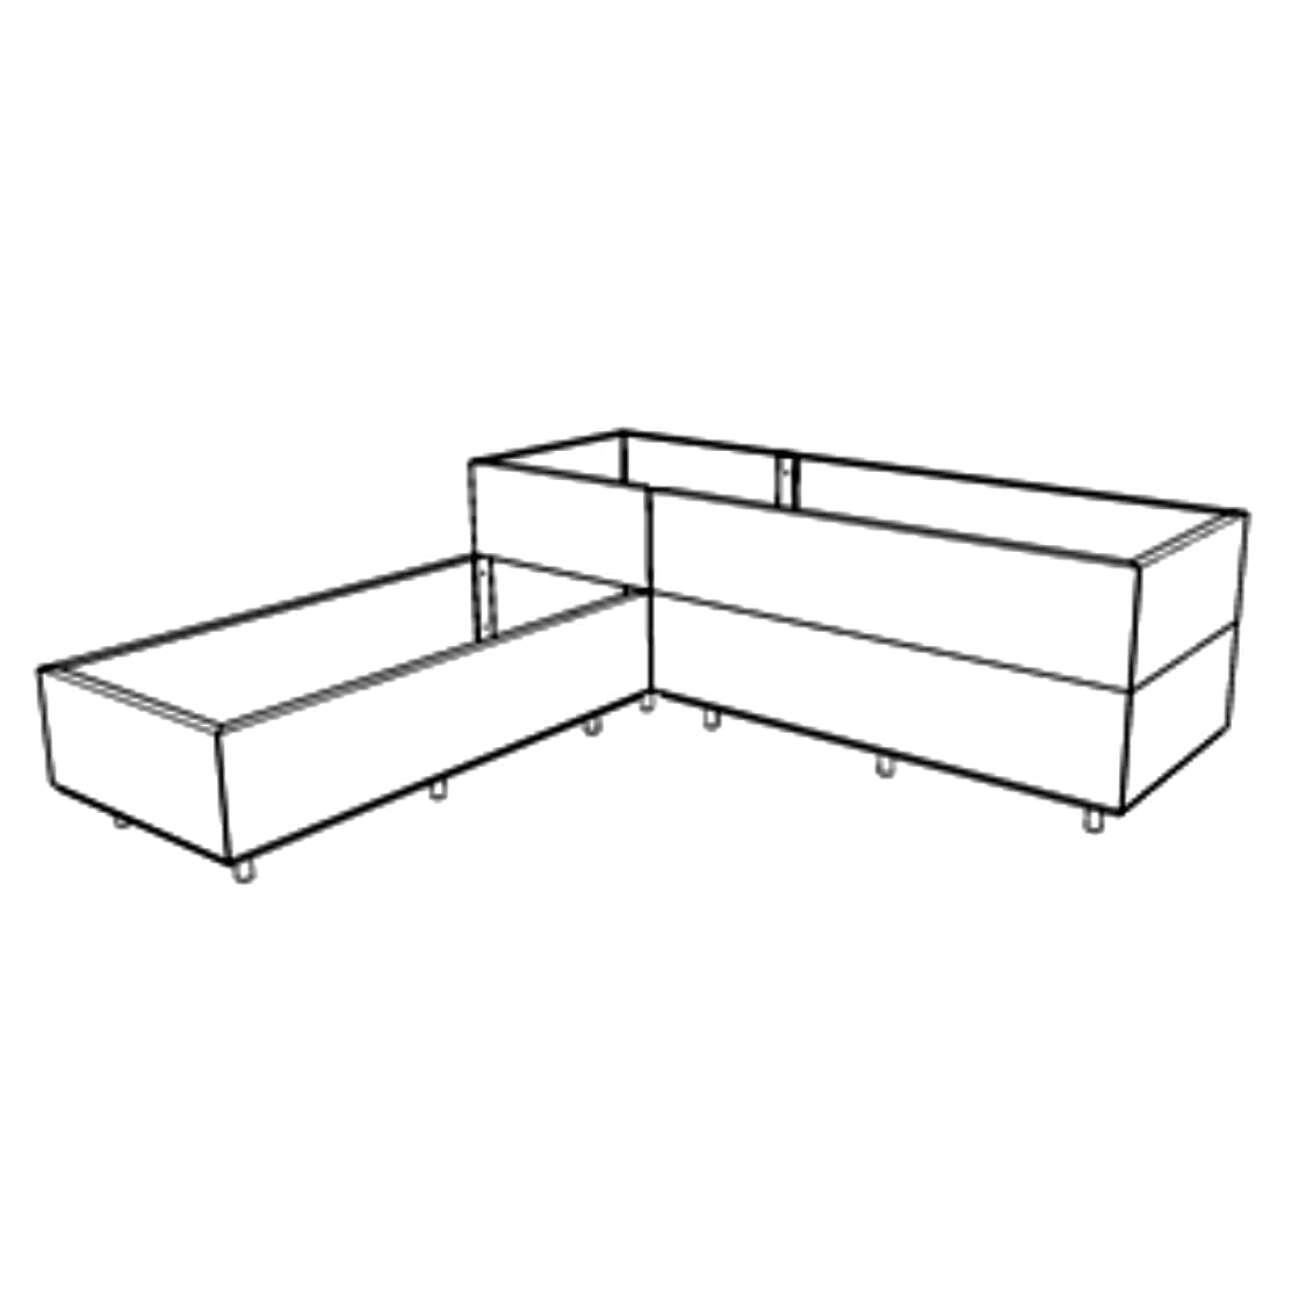 180x180-vinkel-plantekasse-fra-Fine-Design